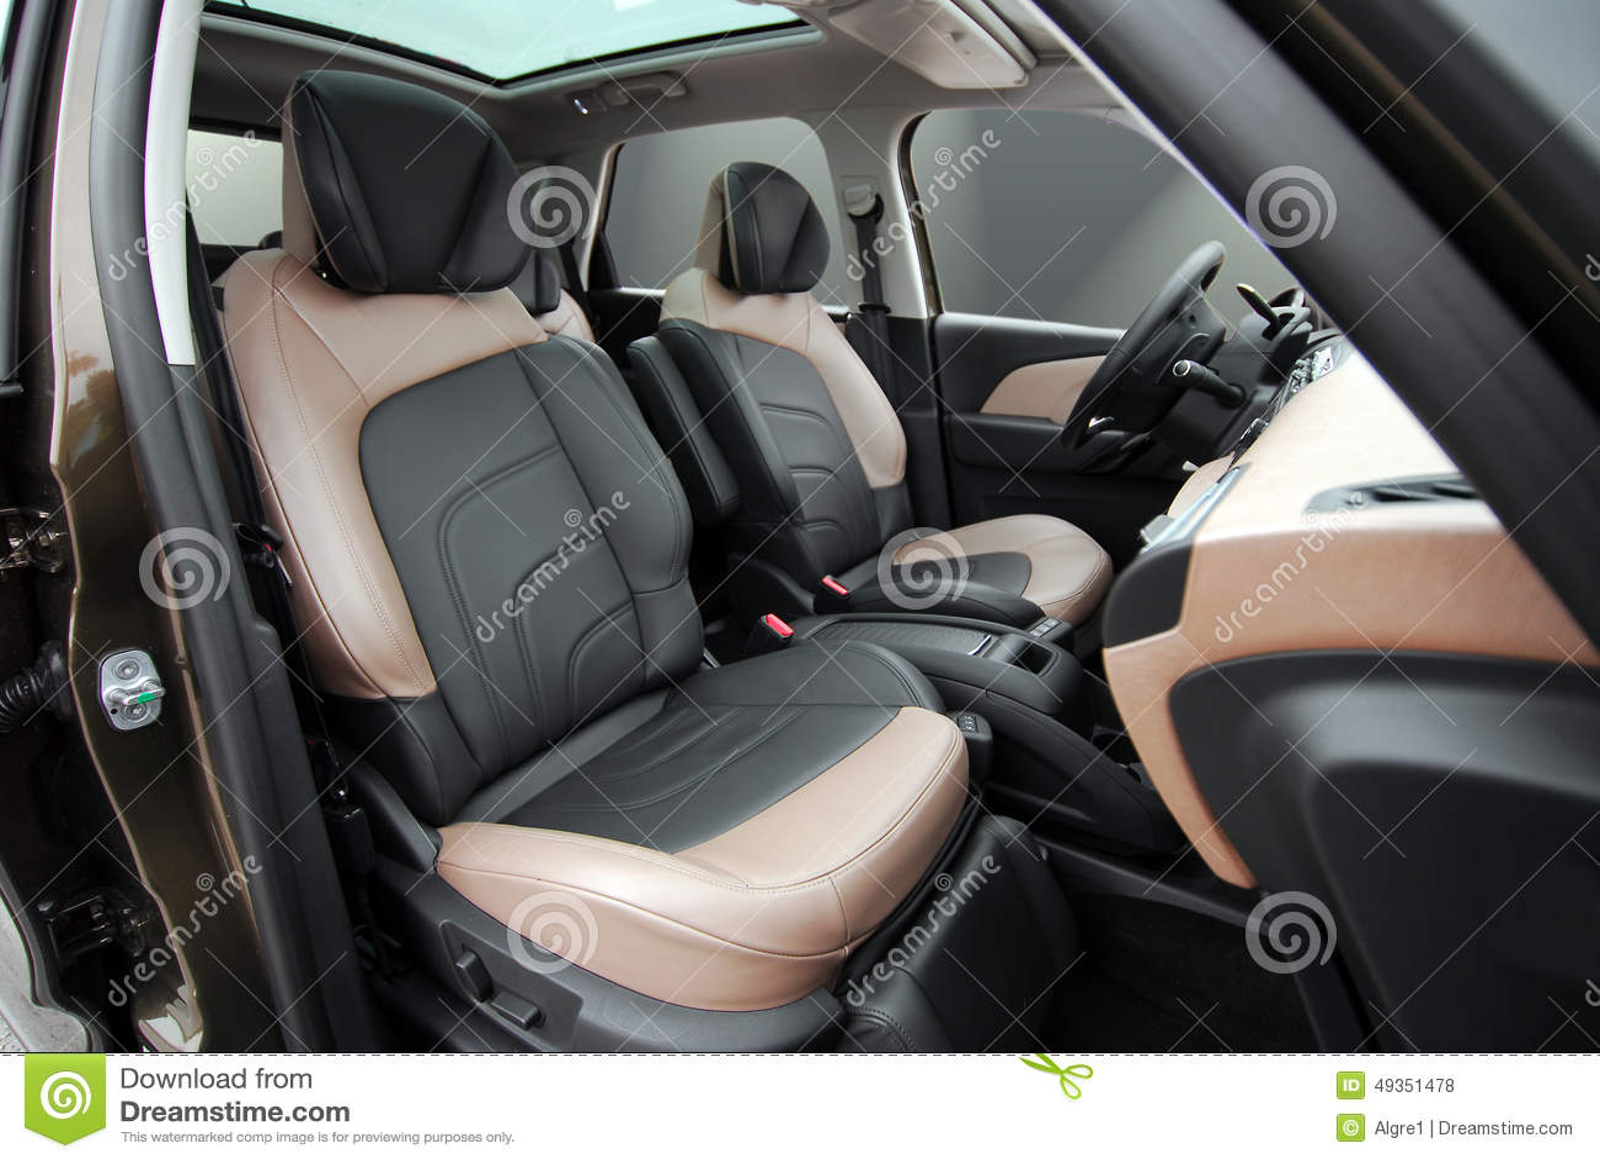 front car seats stock photo image 49351478. Black Bedroom Furniture Sets. Home Design Ideas